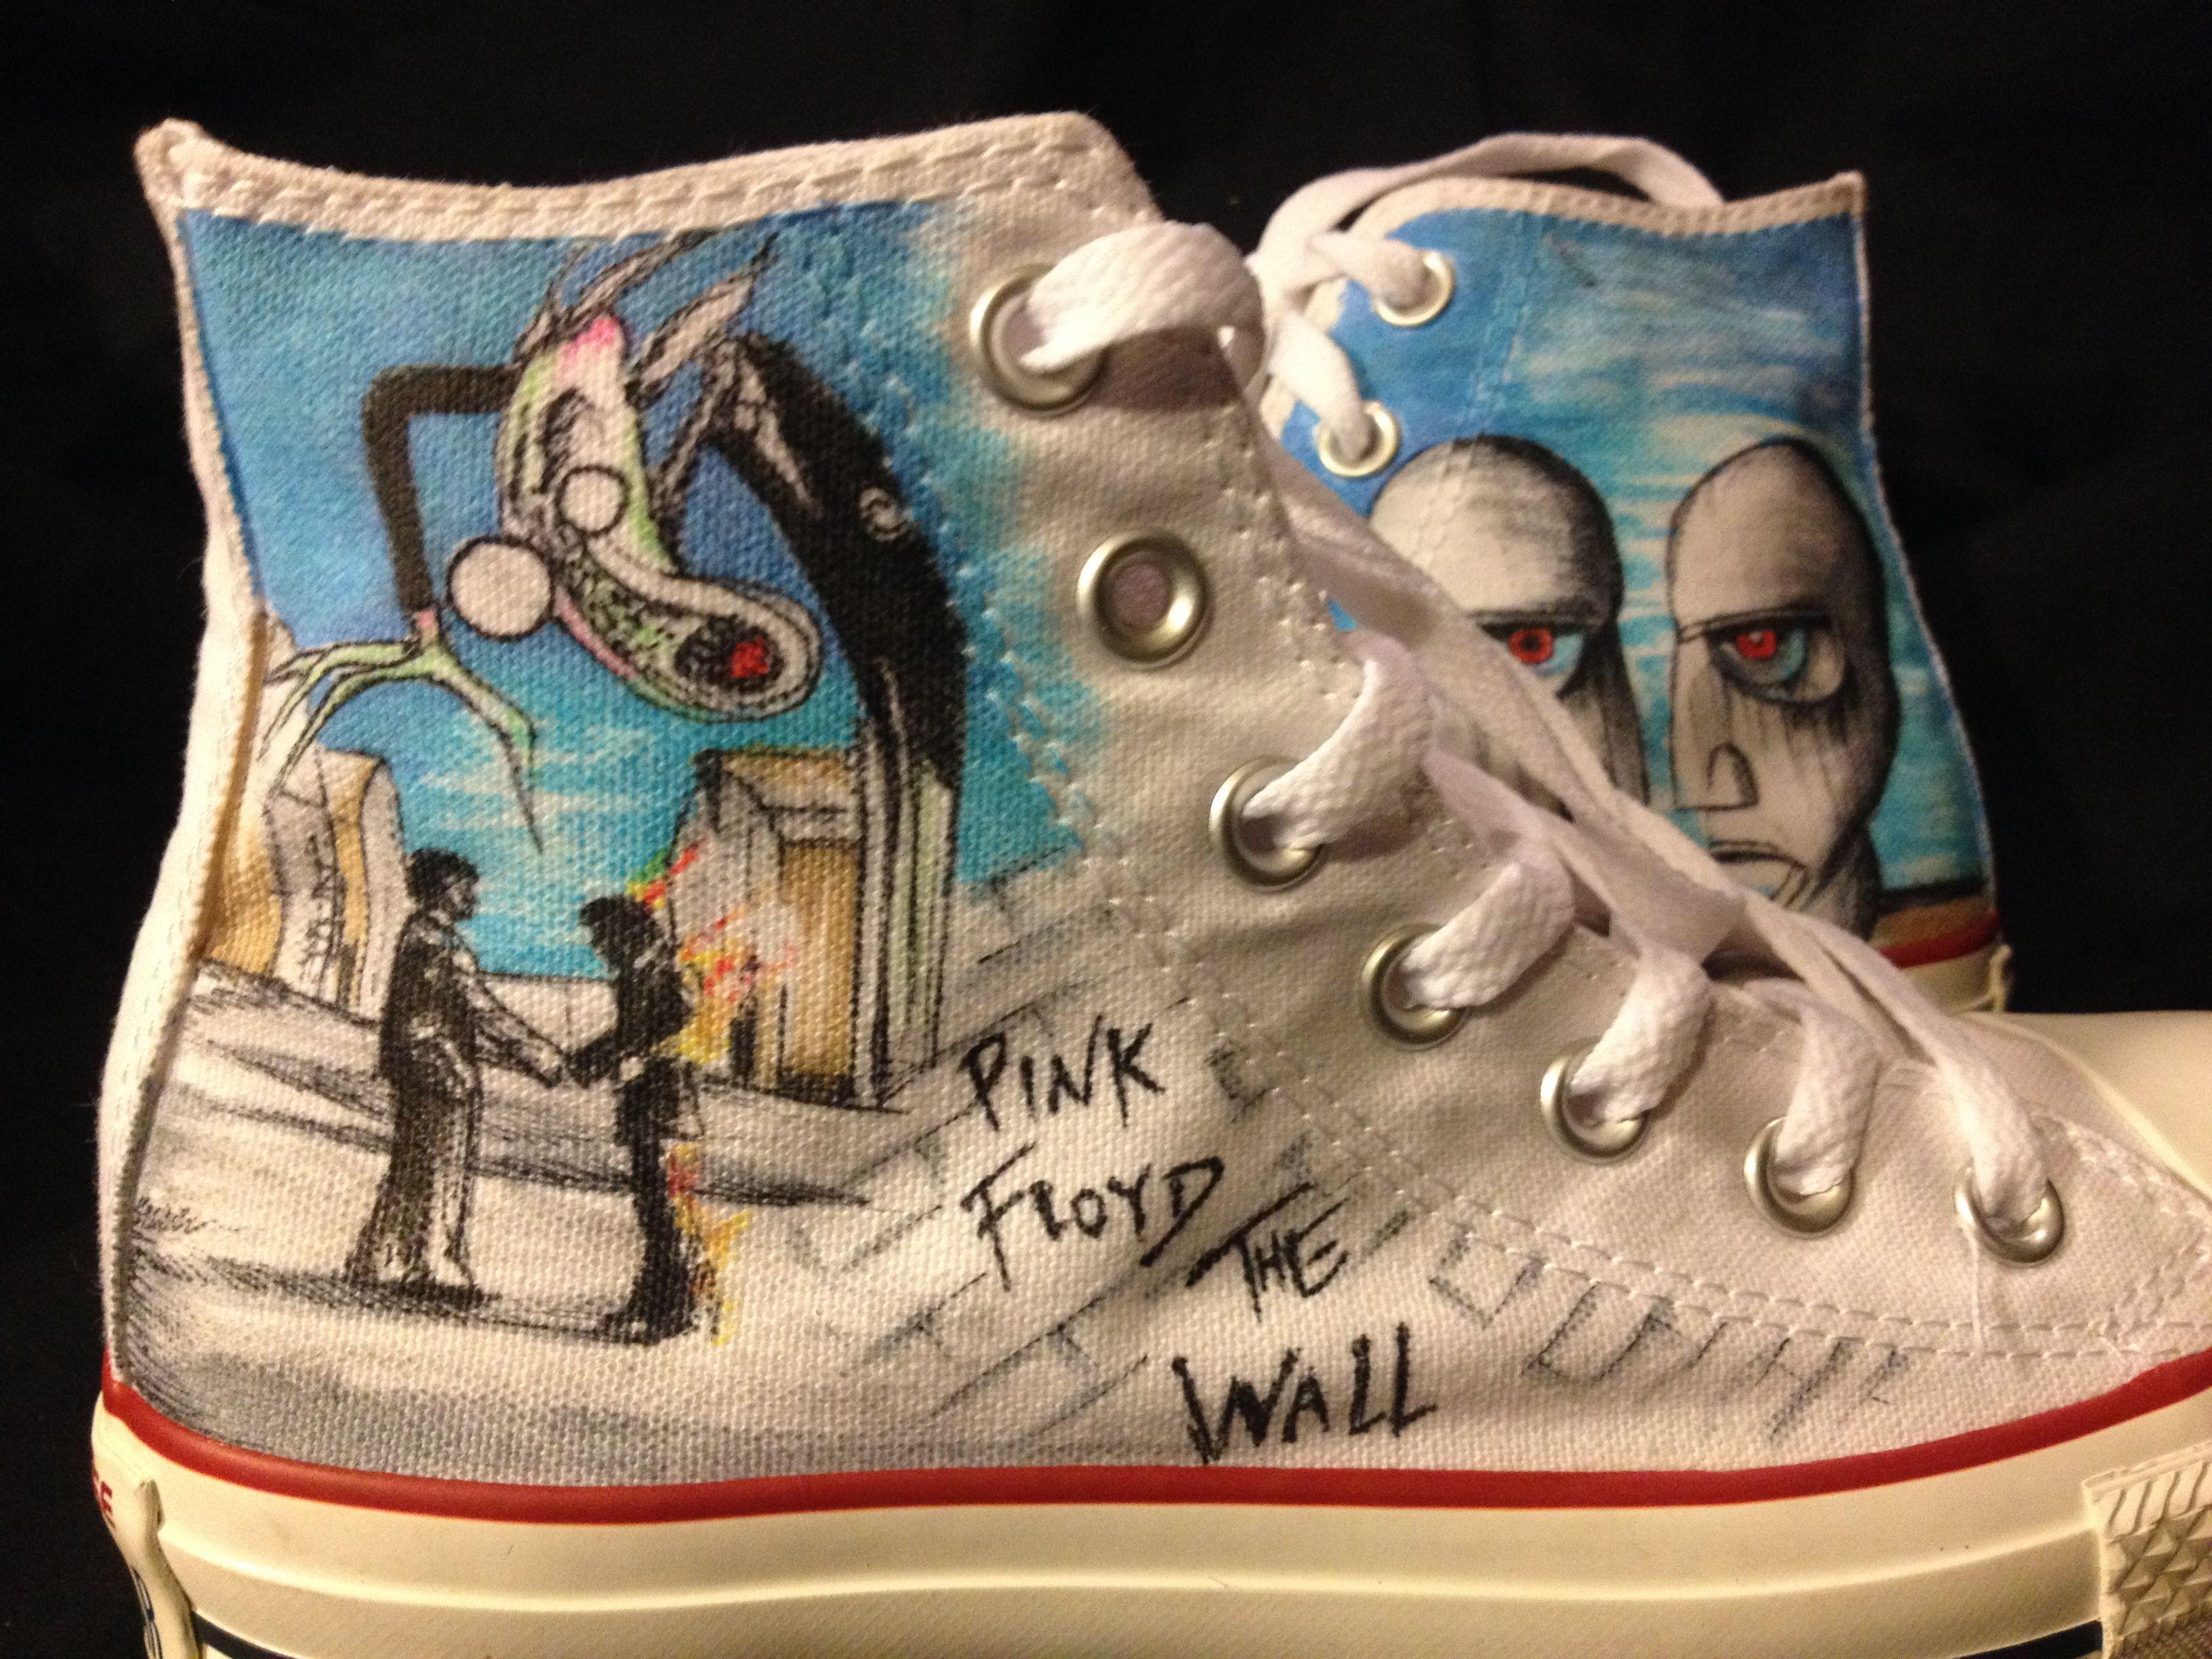 e9e3f7d25634ba Buy Hand Made Hand Drawn Pink Floyd Shoes